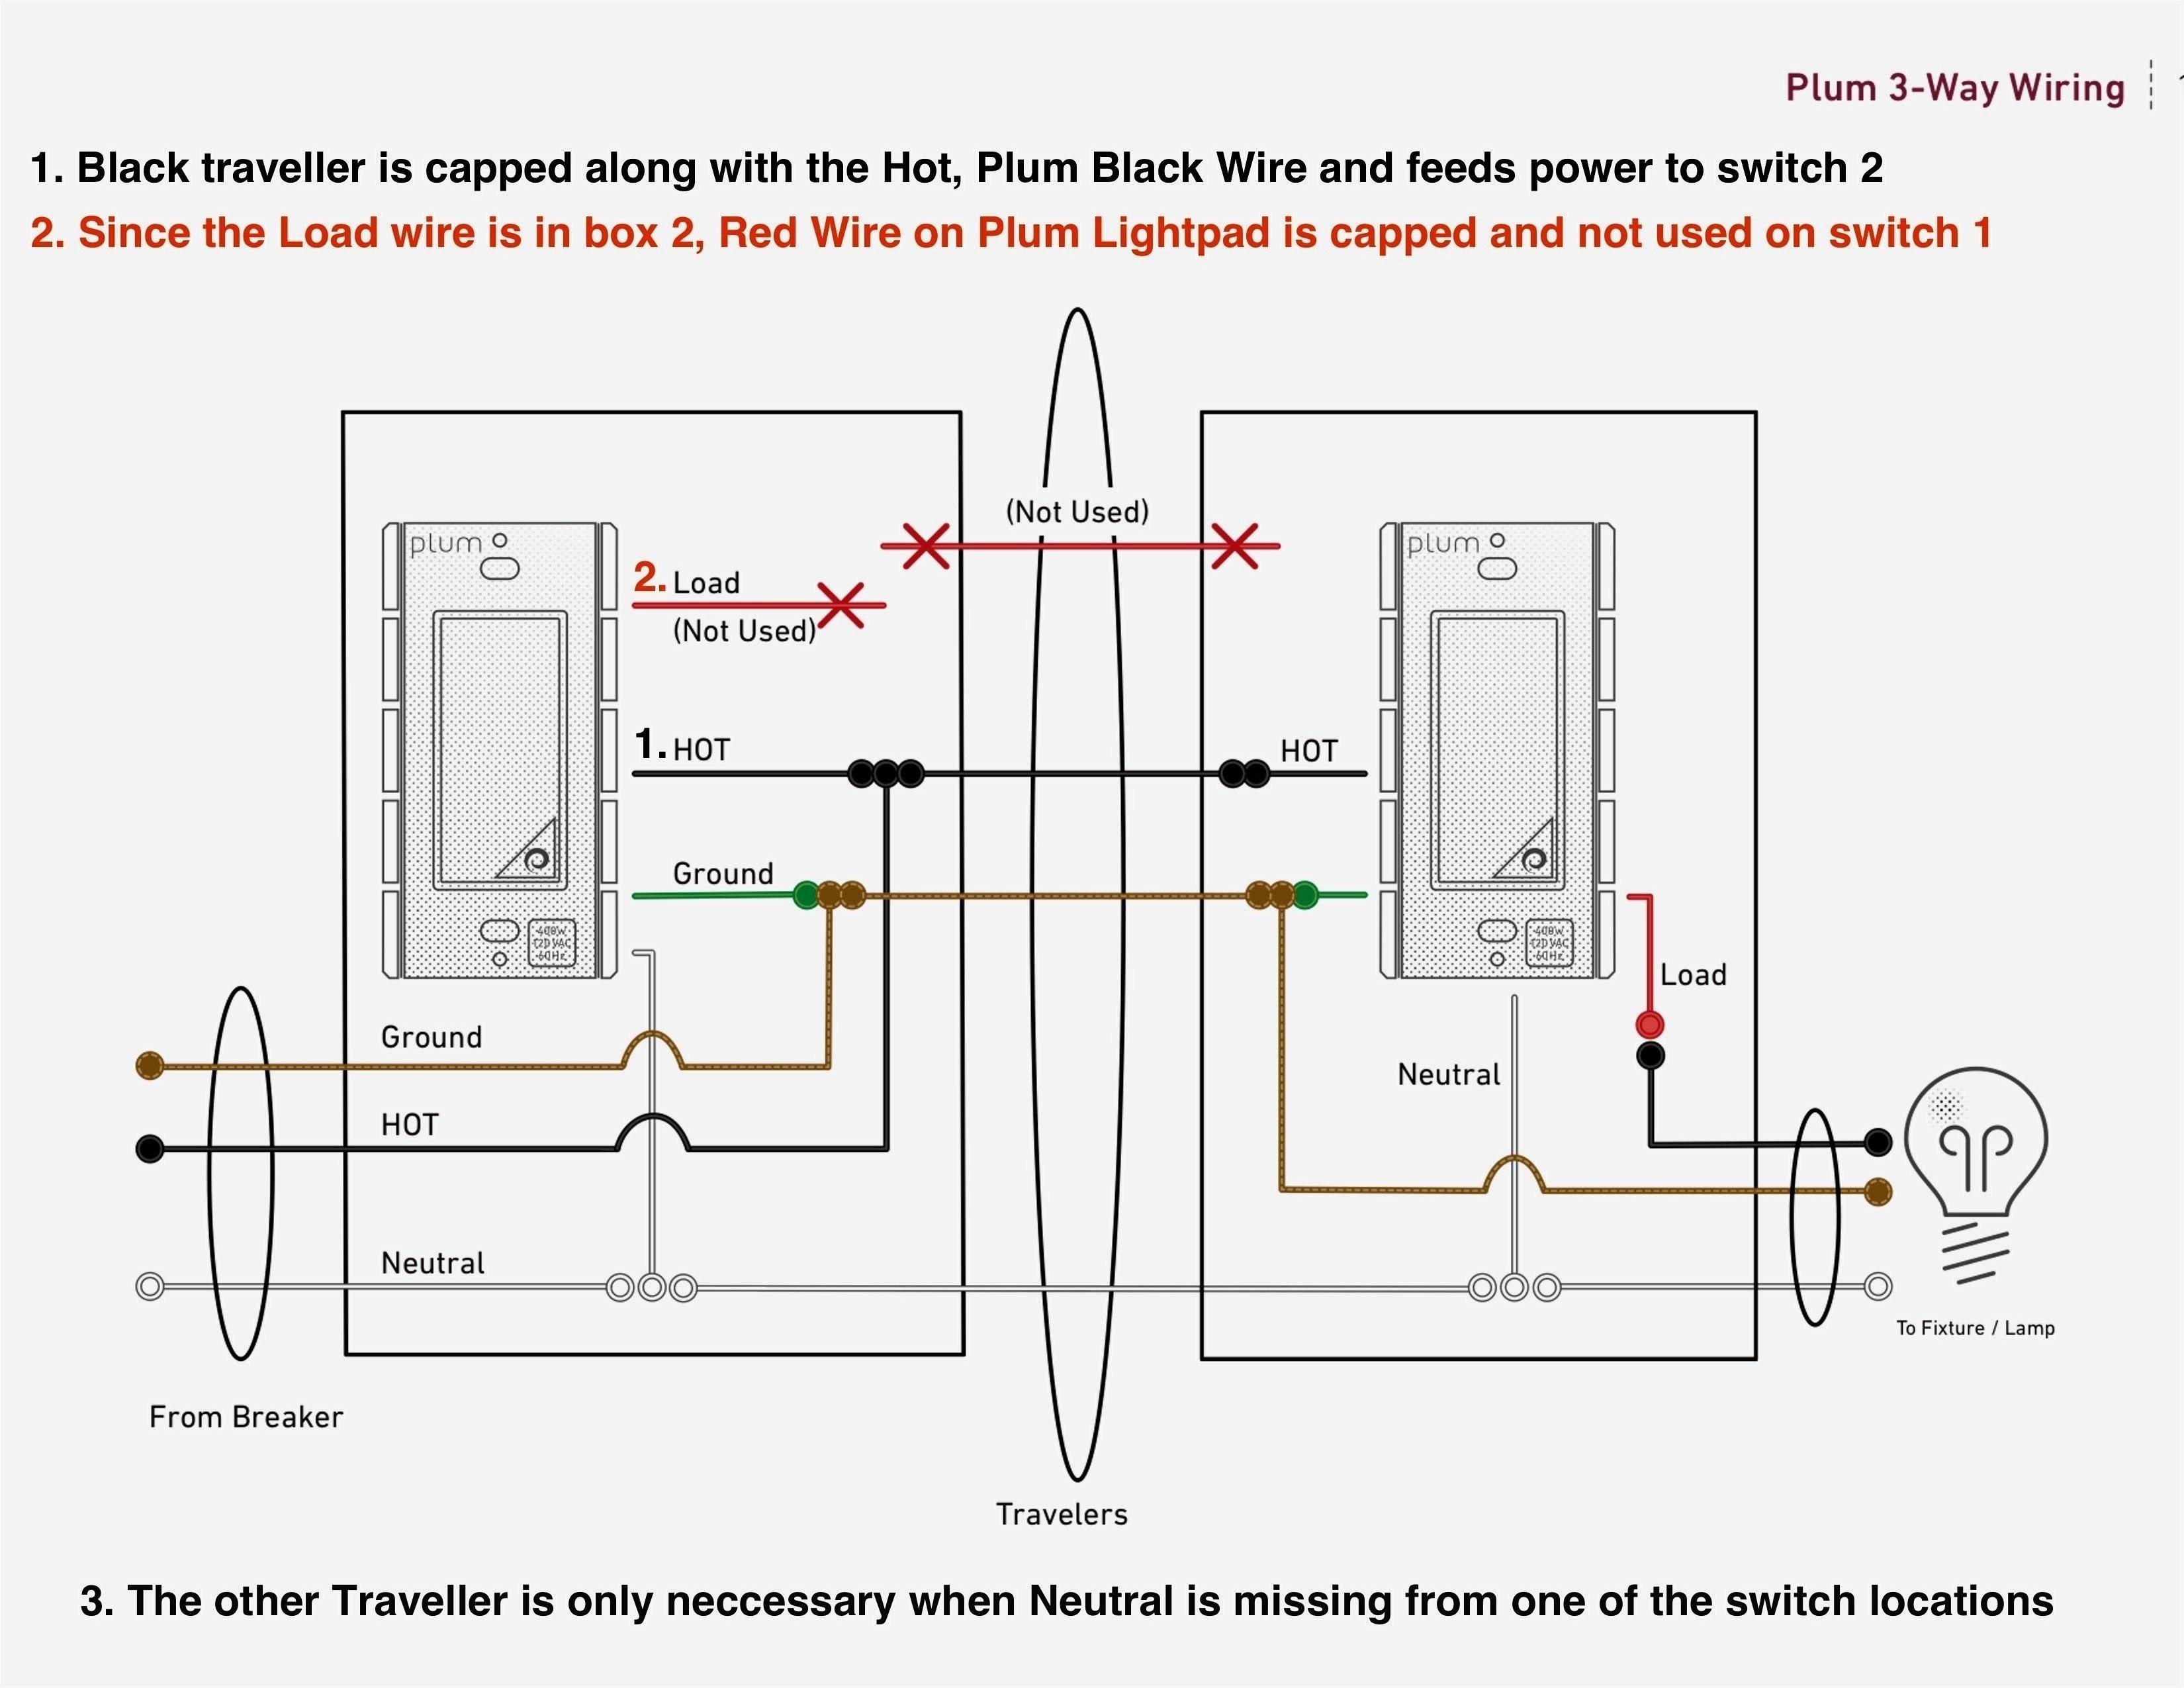 wiring three way switch diagram 3 reflector telescope how to wire a dimmer blog maestro v9 schwabenschamanen de u2022 methods